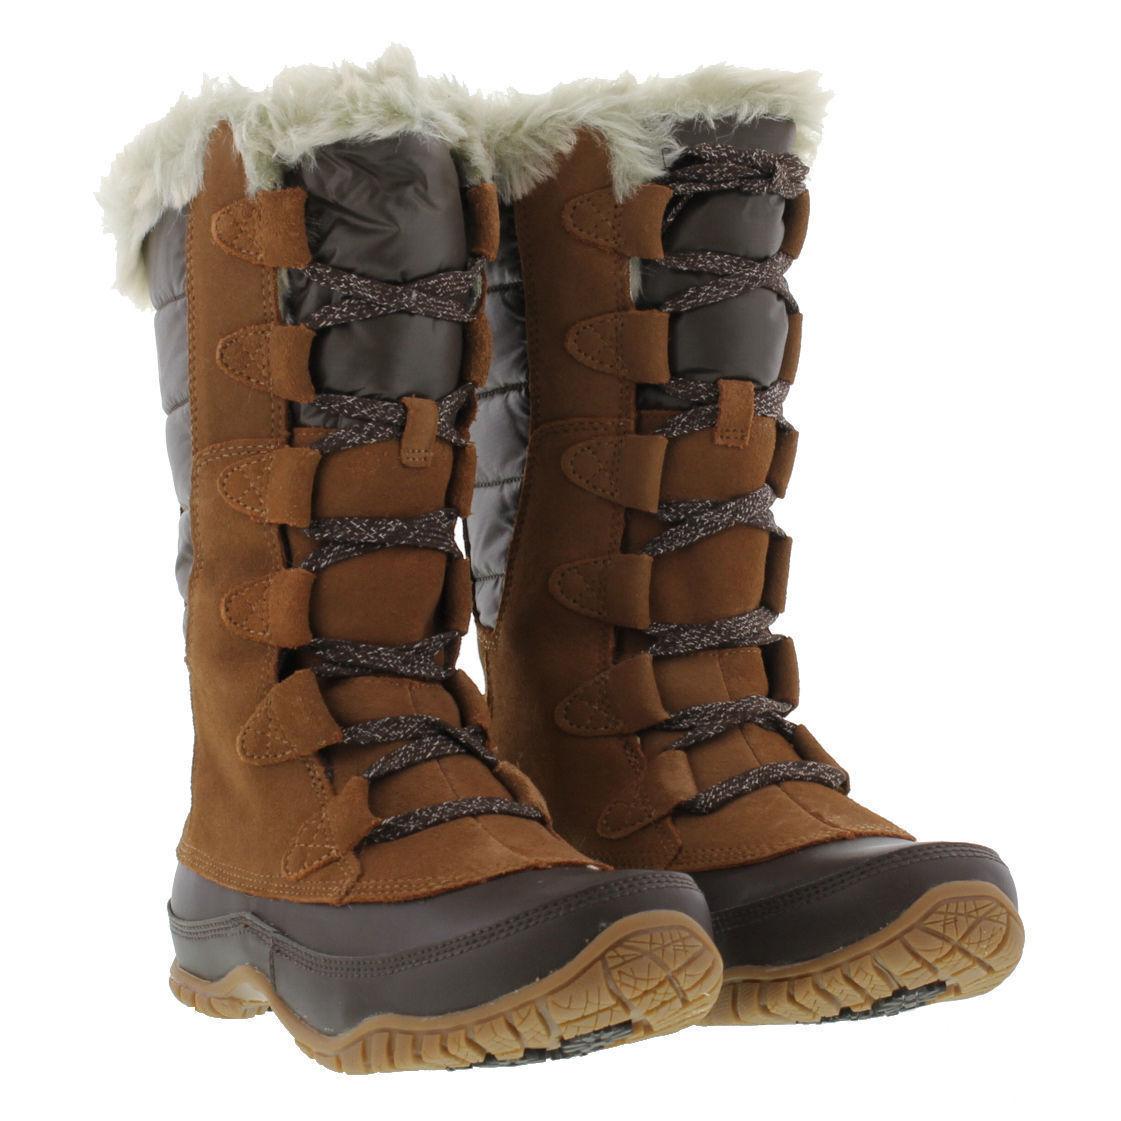 Top 10 Winter Boots for Women   eBay